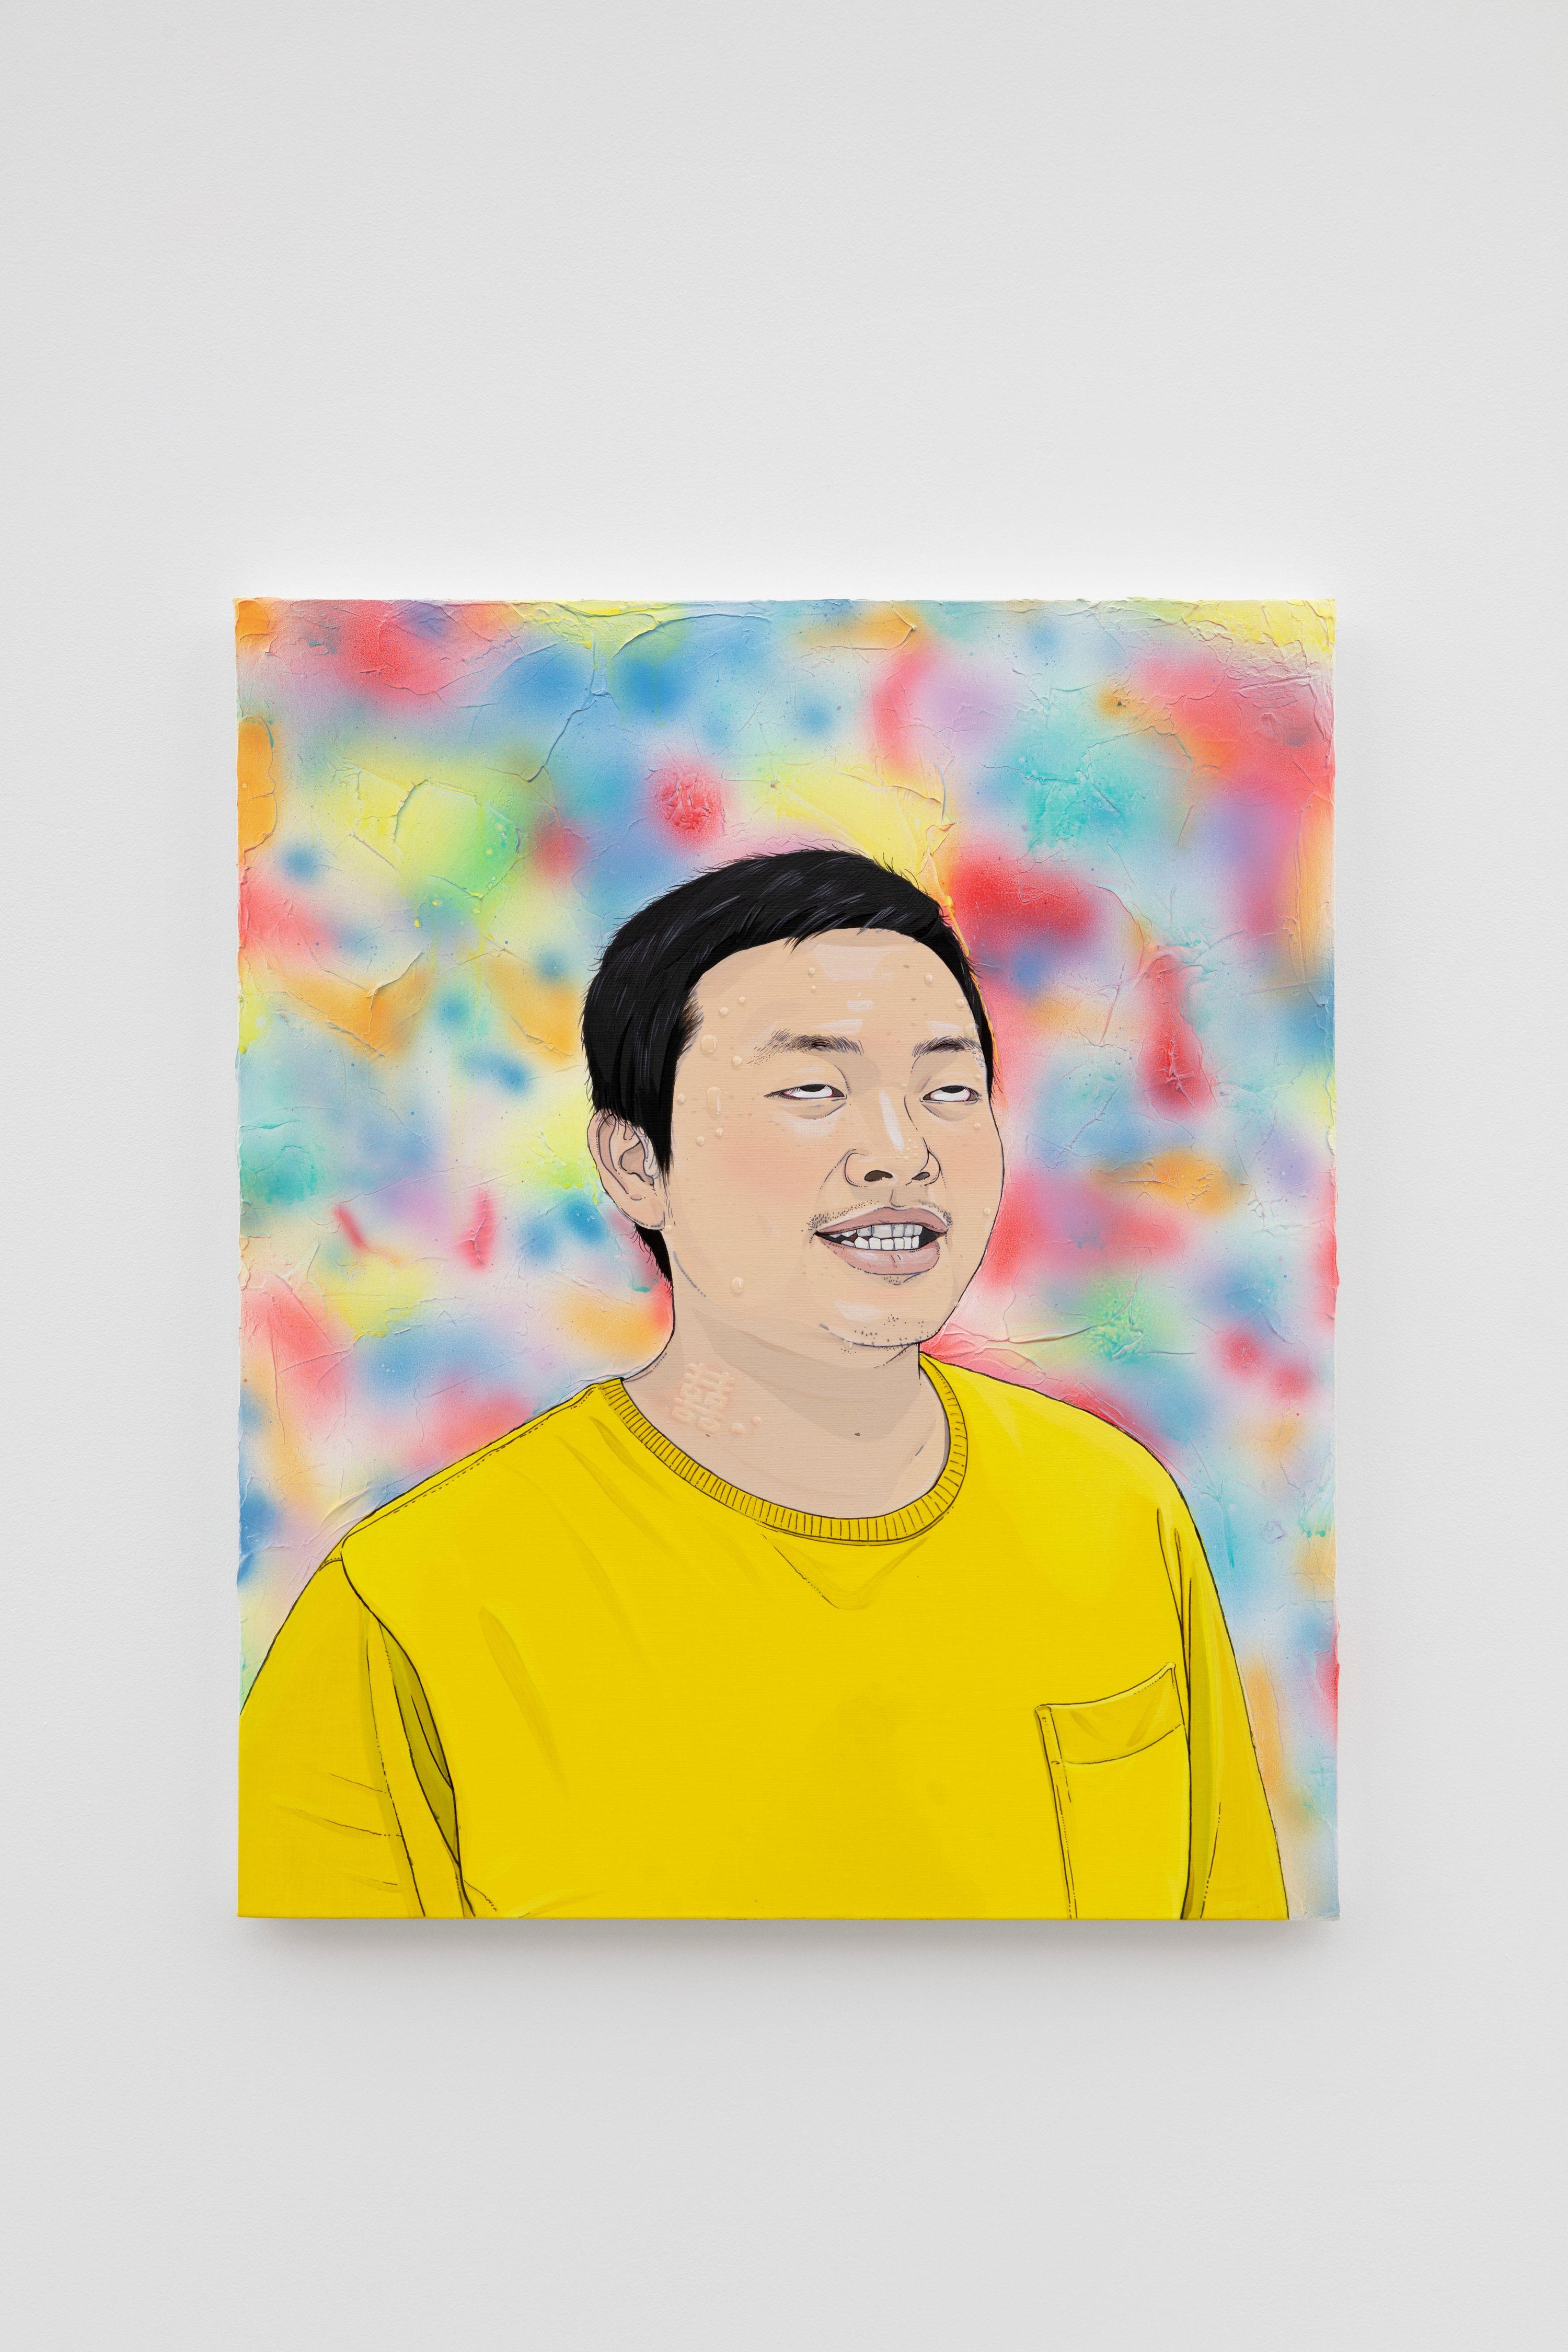 Art Student Chen Fei